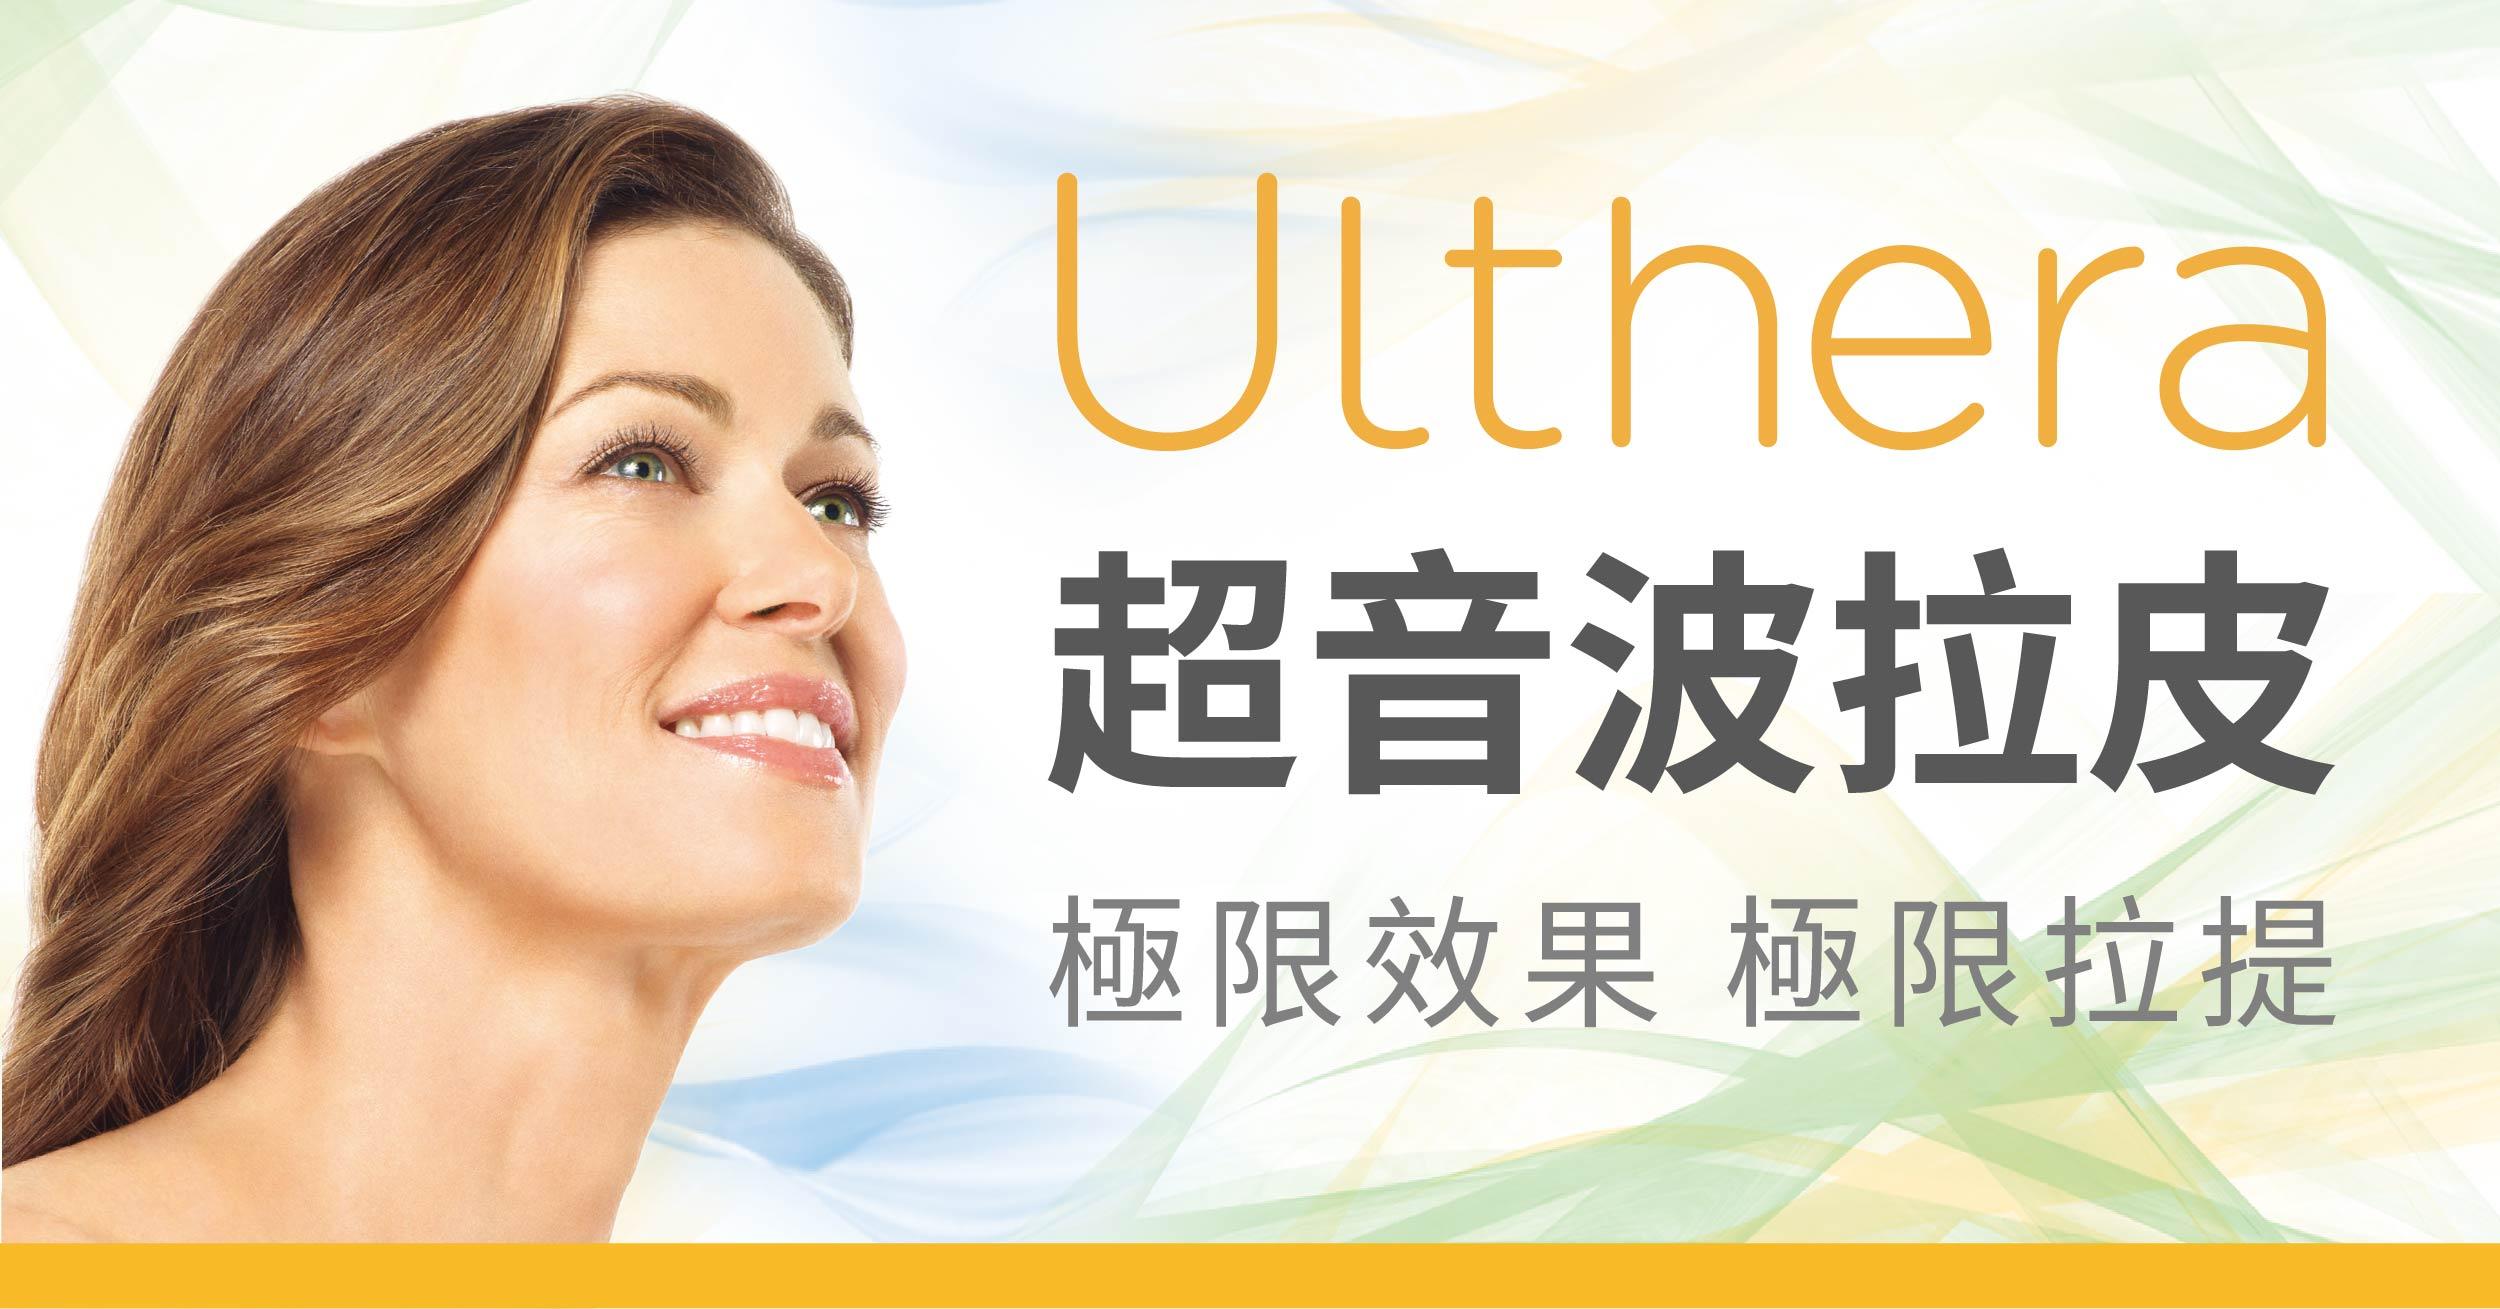 ulthera,極線音波拉皮,ultherapy,thermage